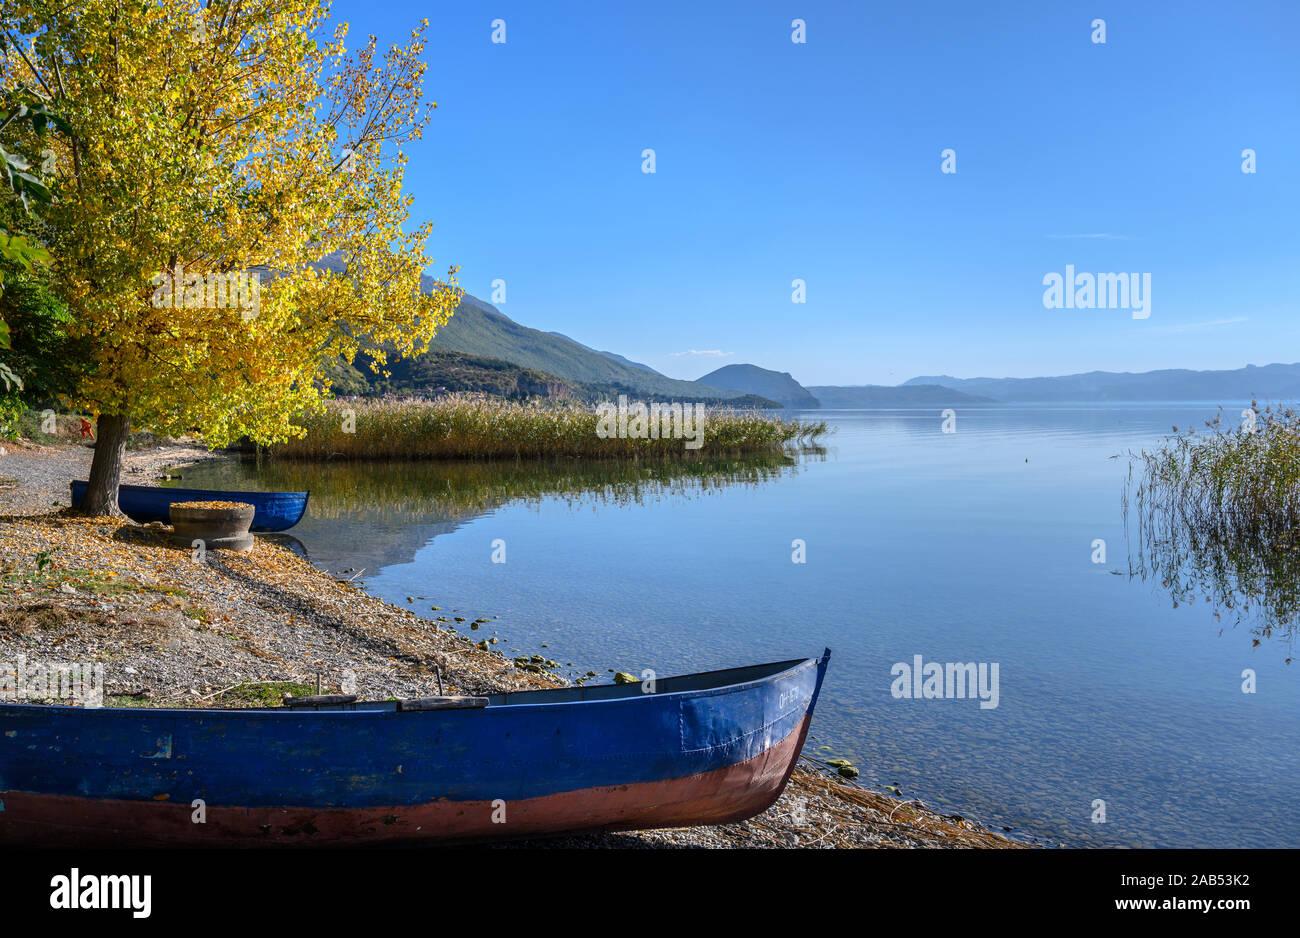 Autumn on the shore of Lake Ohrid near Peshtani in North Macedonia, Europe. Stock Photo